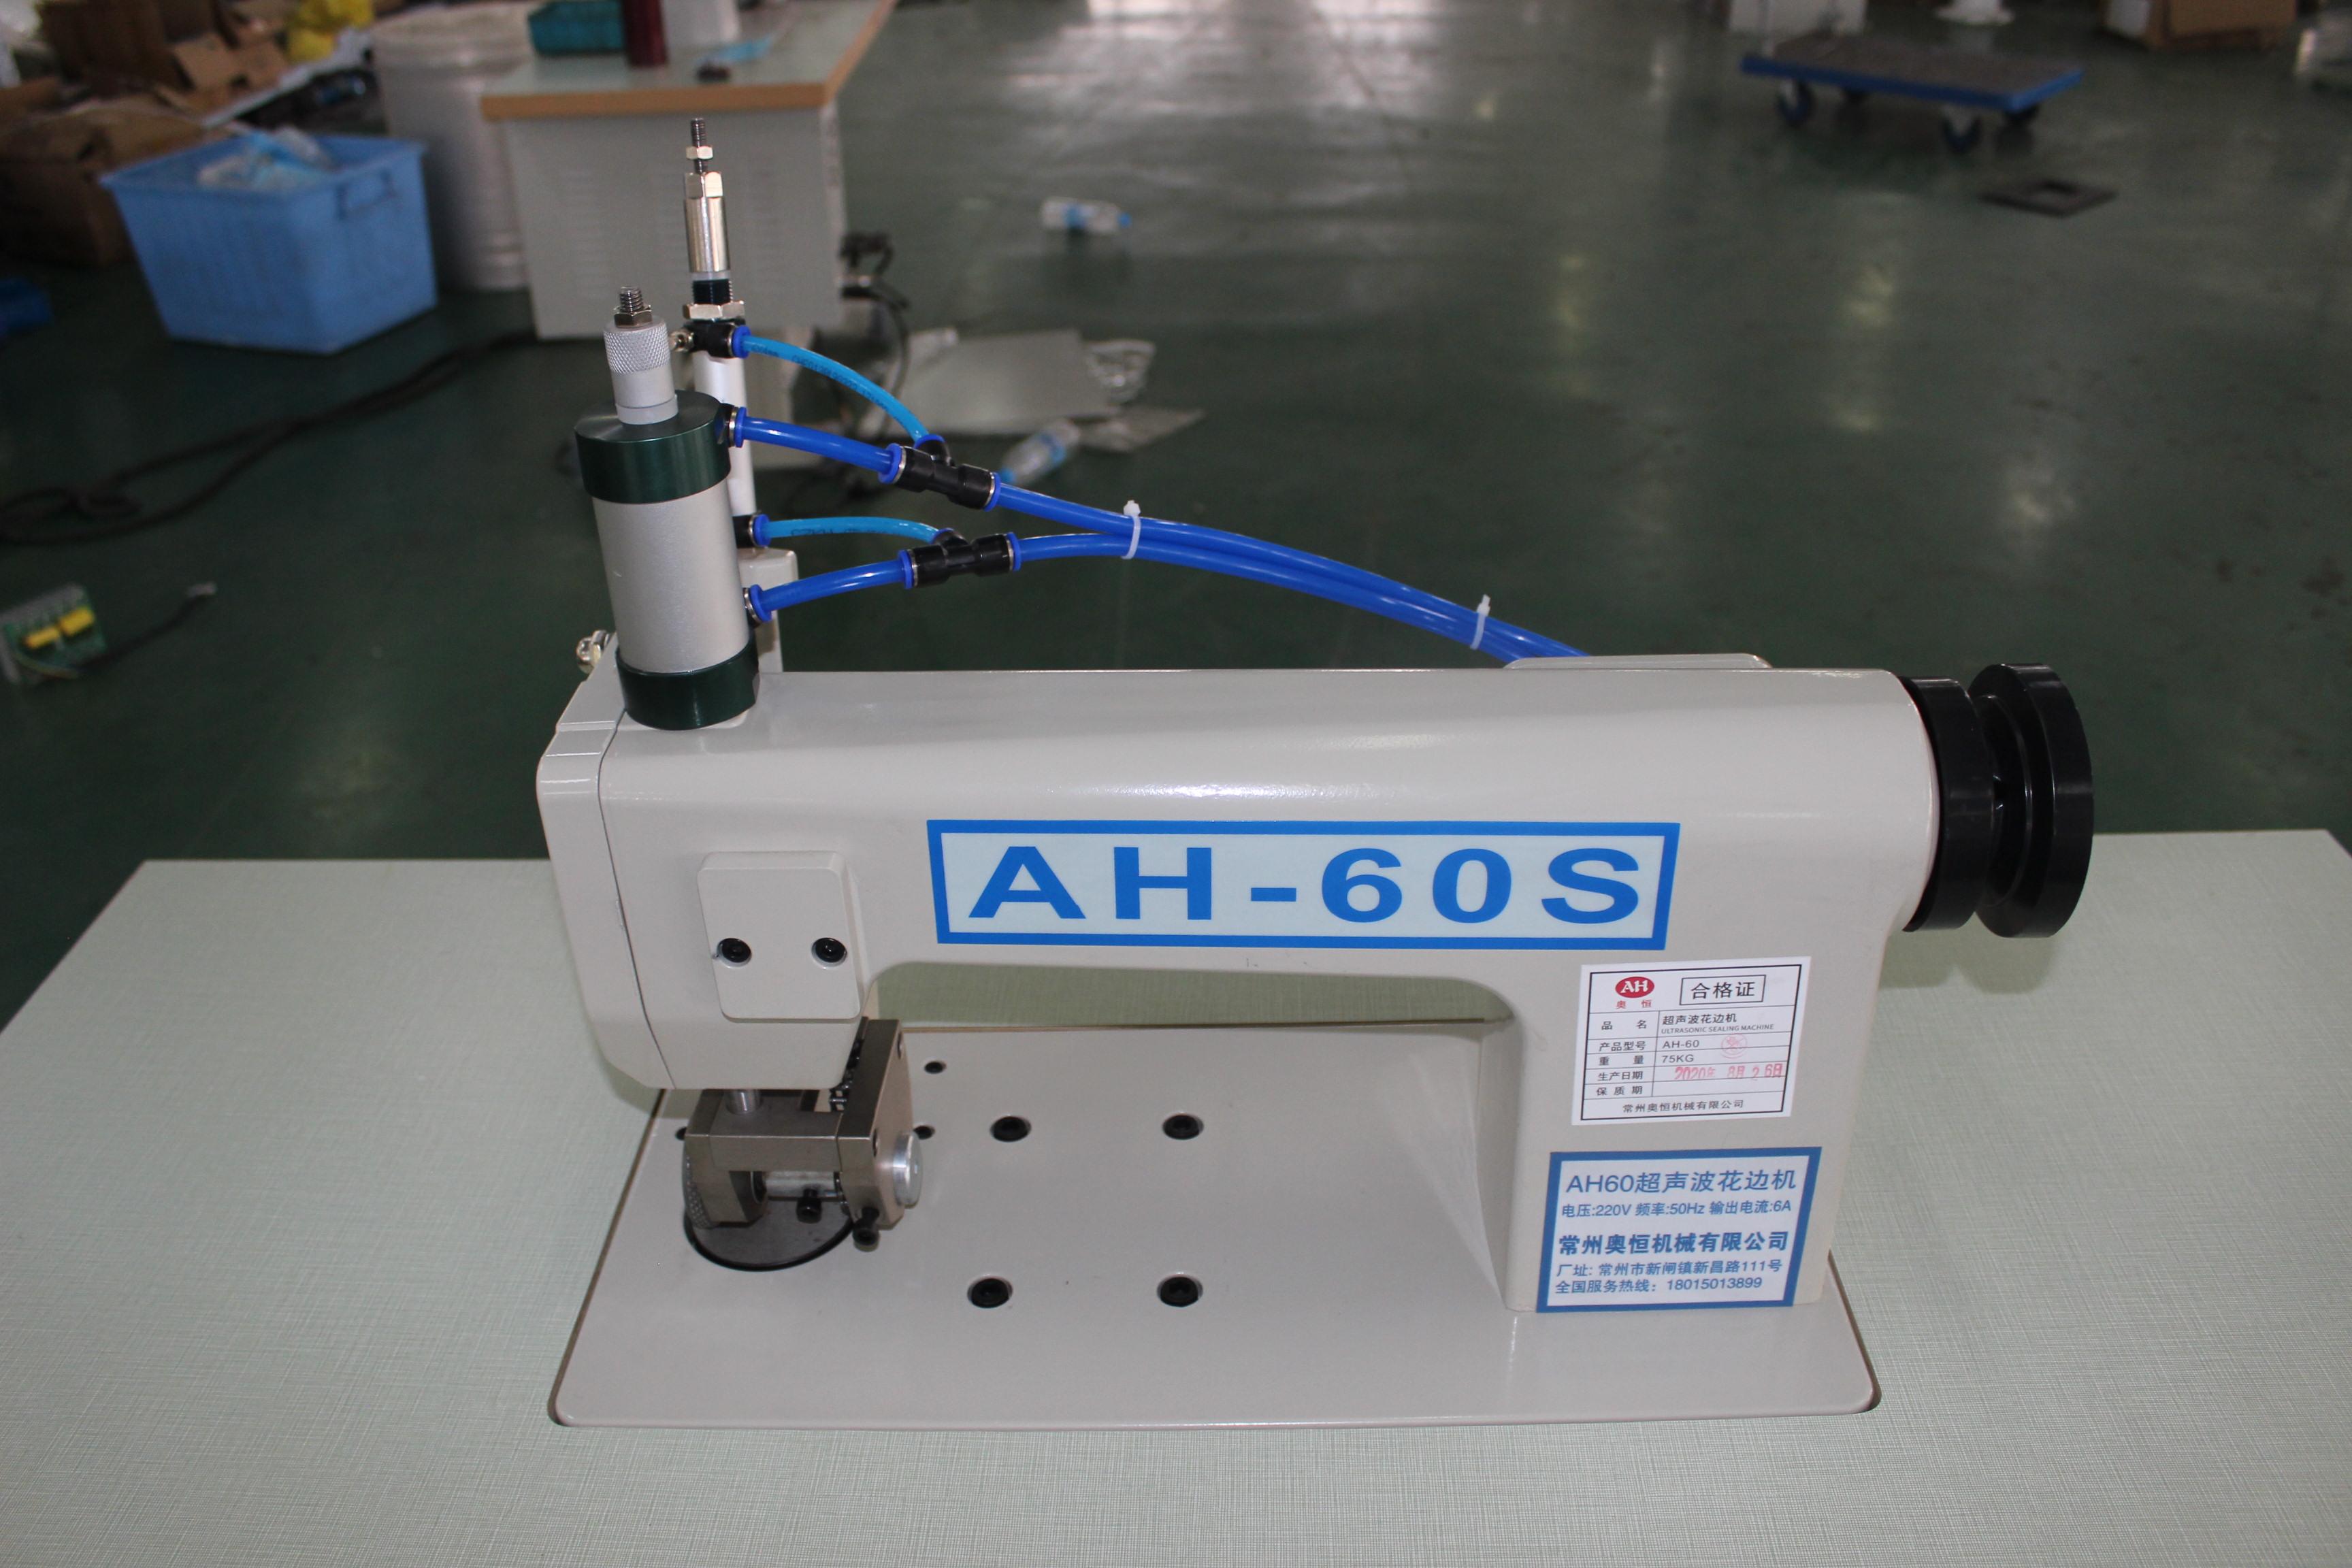 AH-60-2Q Production Cloth Shopping Bag Lace Trim Braidingcircular lace cutting machine